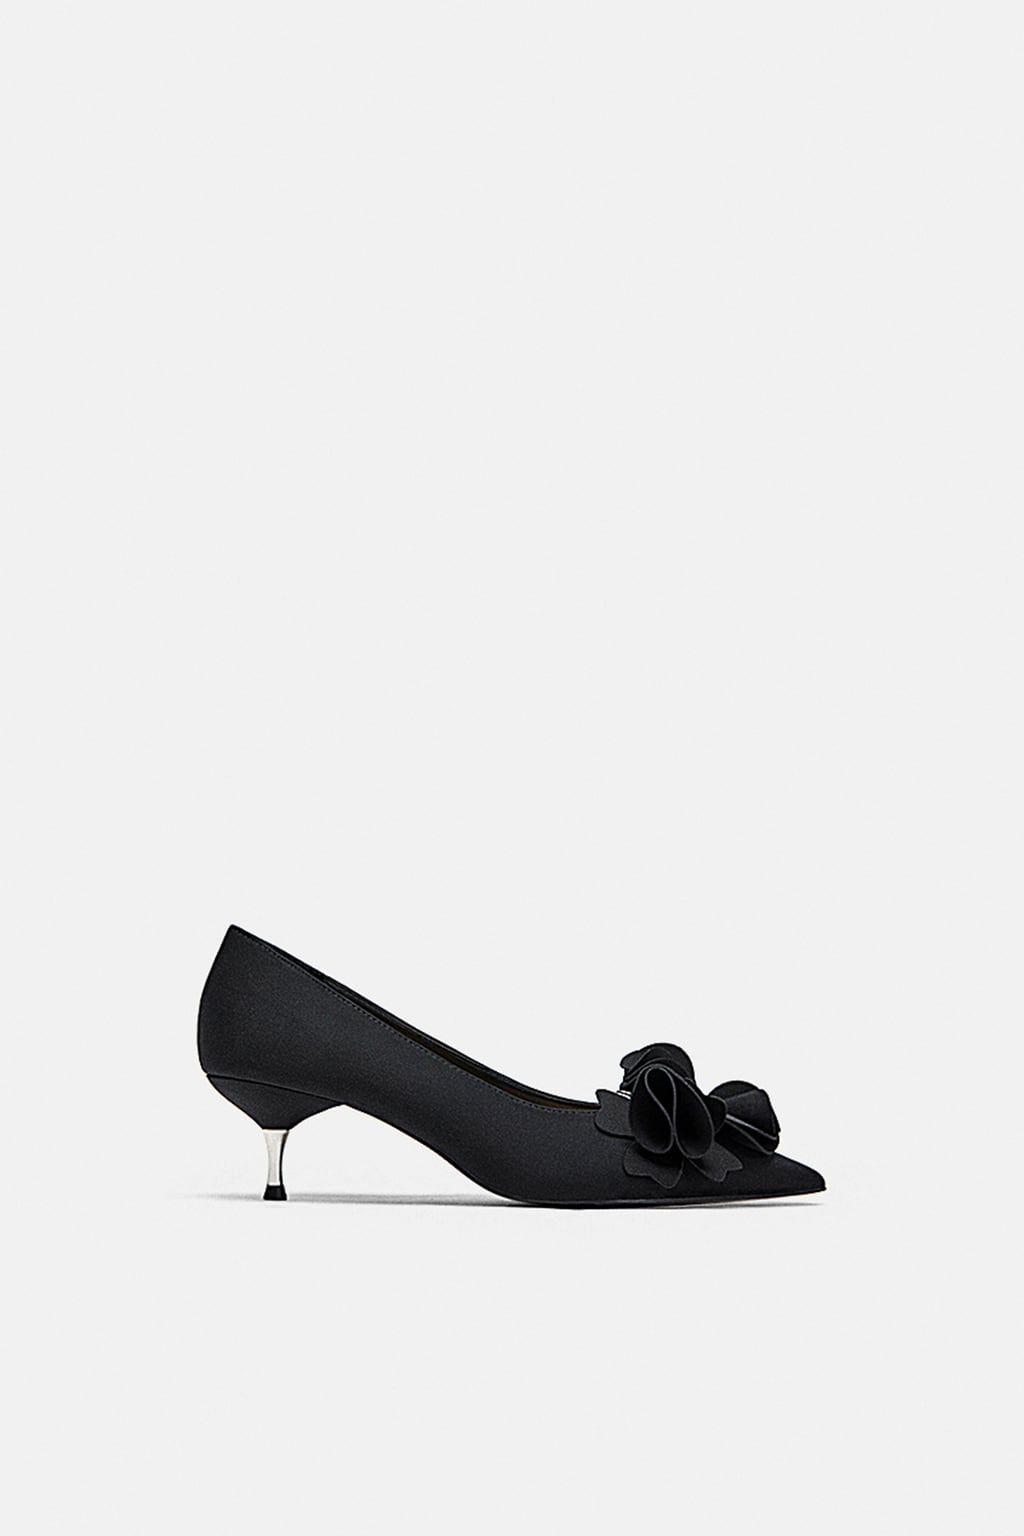 c60e42aea7e ÇİÇEK DETAYLI KISA TOPUKLU AYAKKABI Kitten Heel Shoes